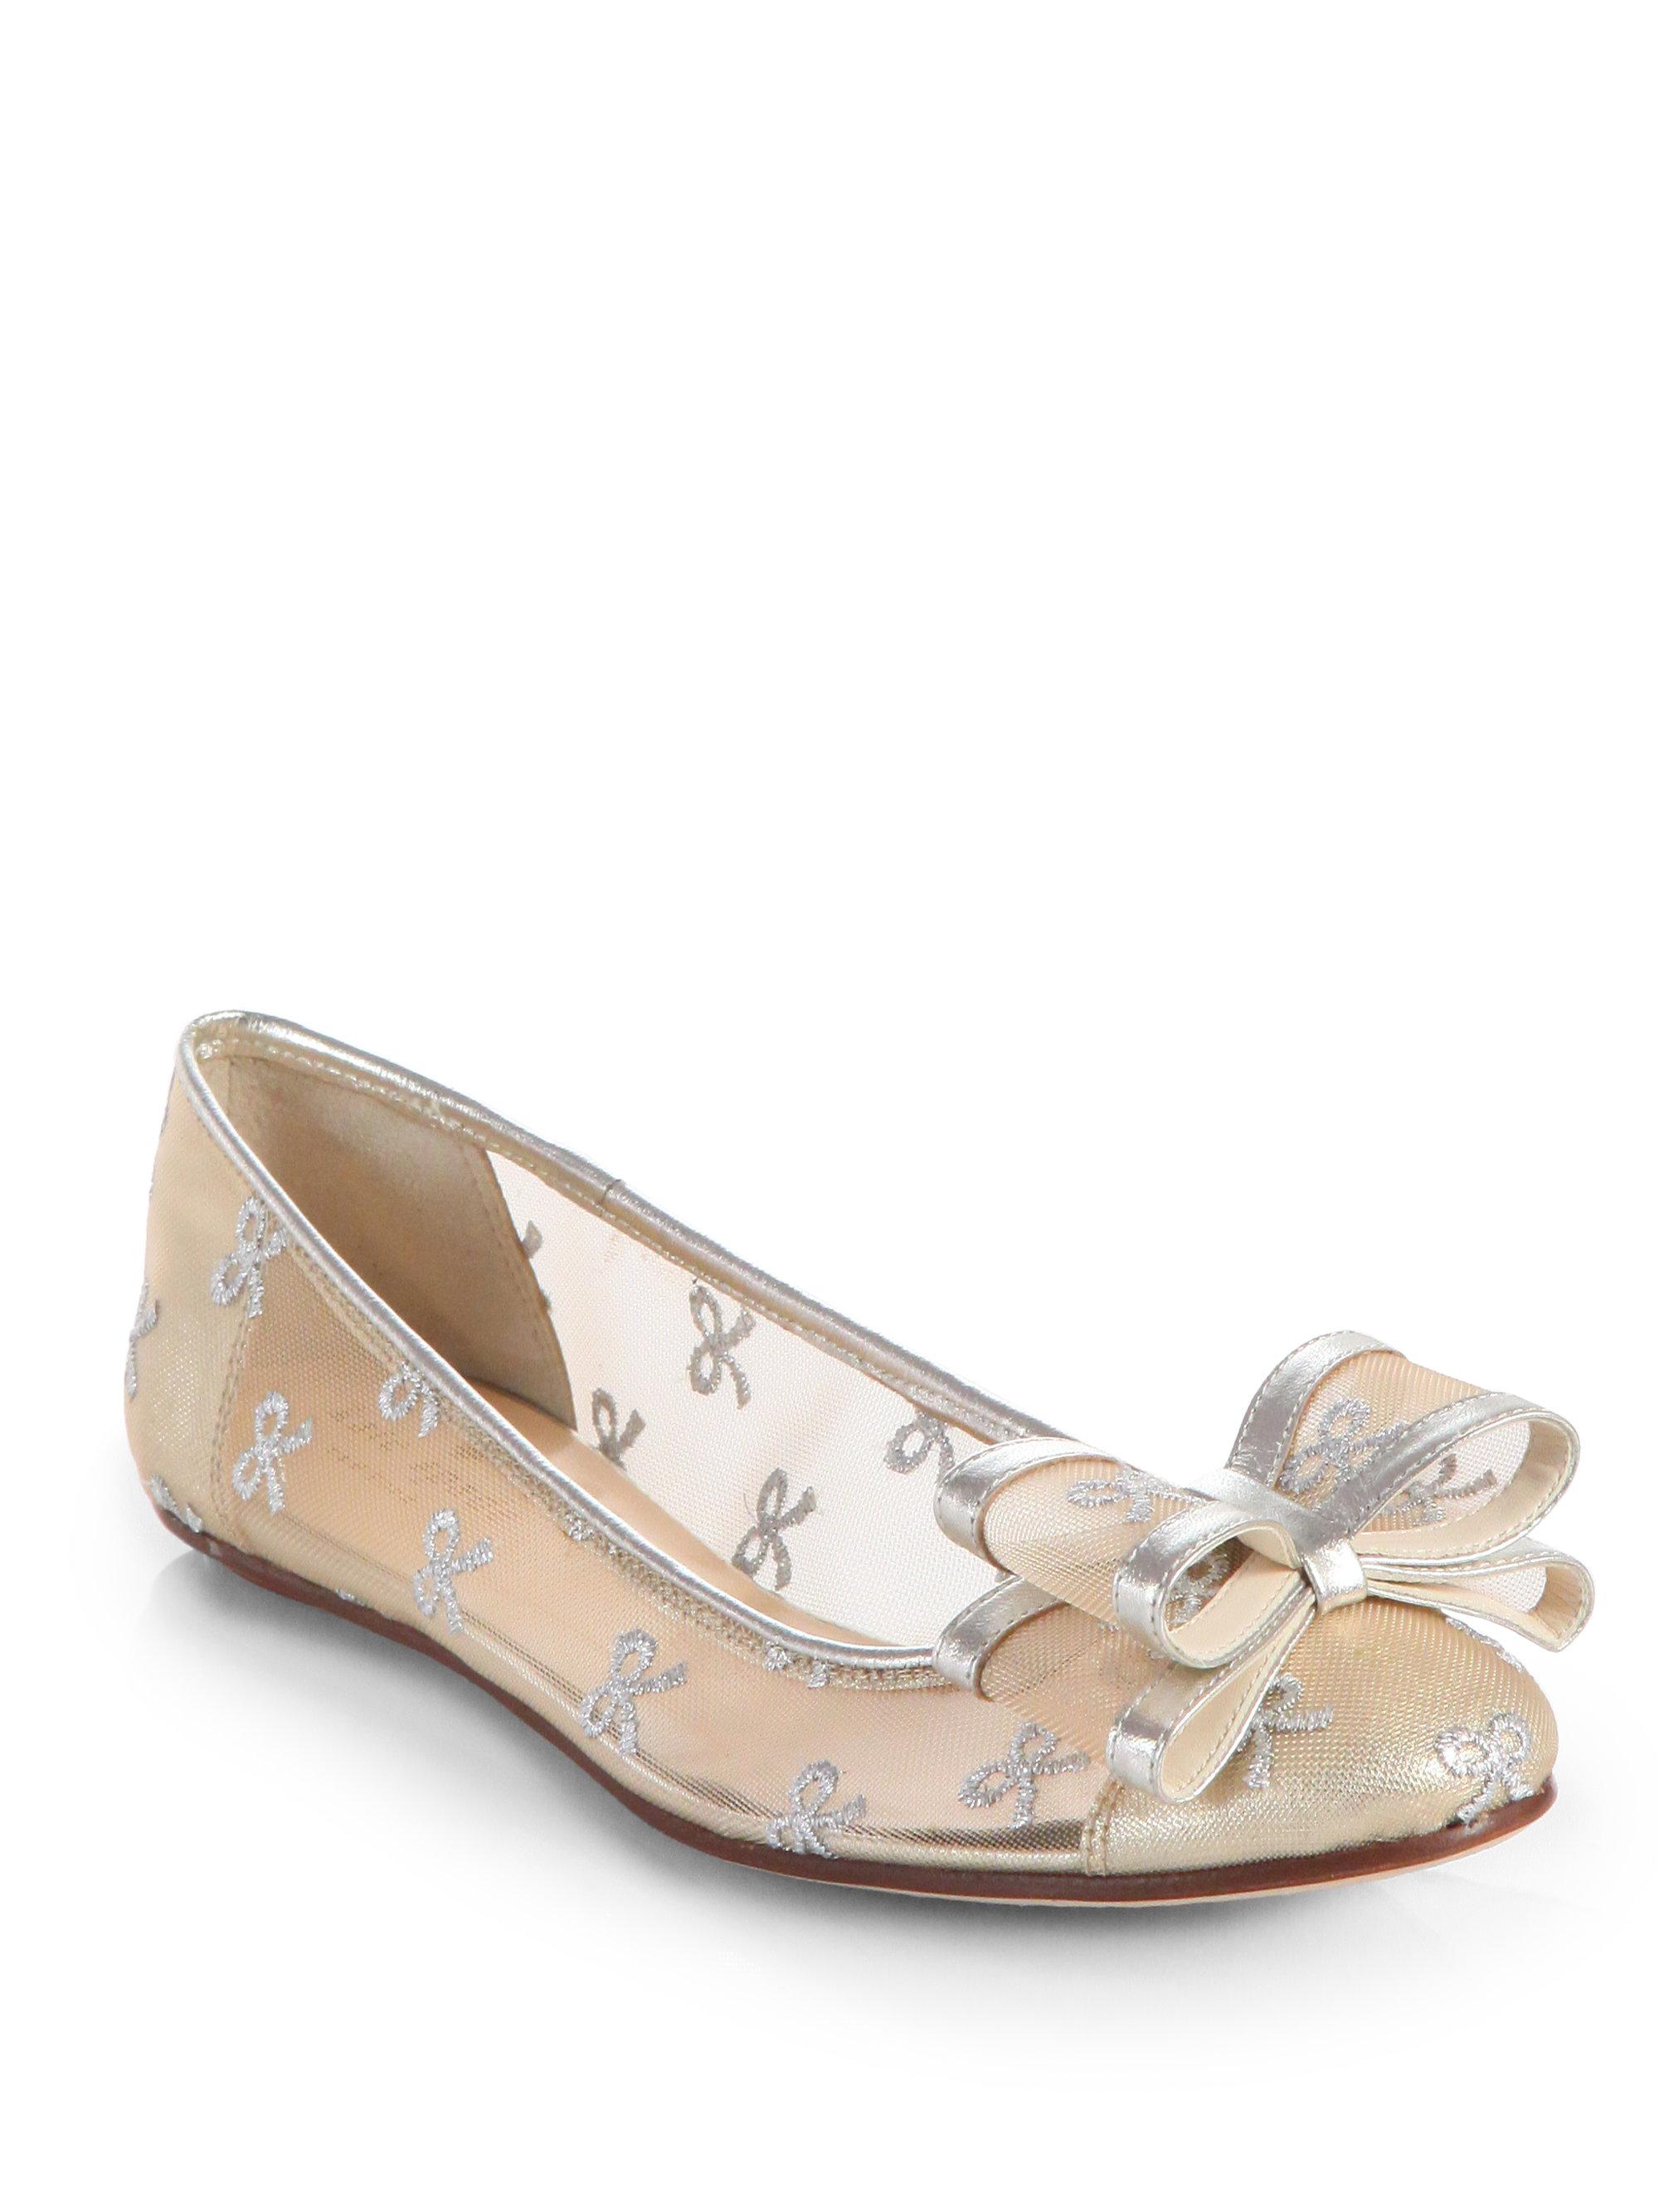 c4b47b7fff7 Lyst - Kate Spade Bernice Mesh Leather Bow Ballet Flats in Metallic